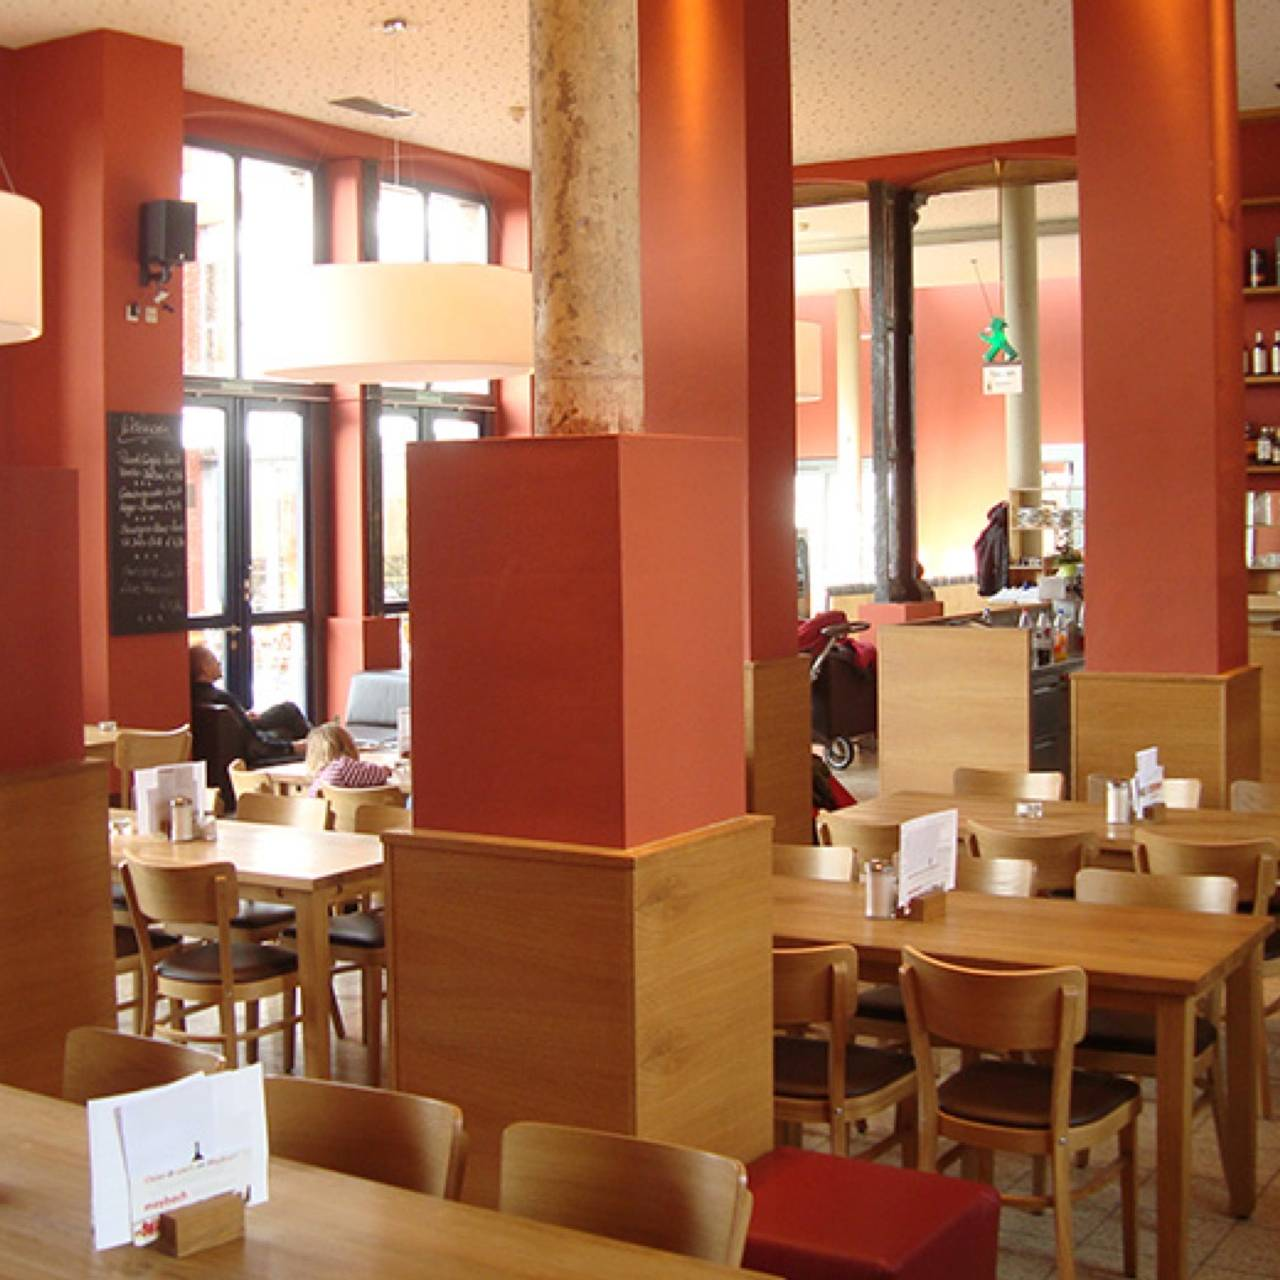 maybach restaurant & biergarten restaurant - köln, nw | opentable